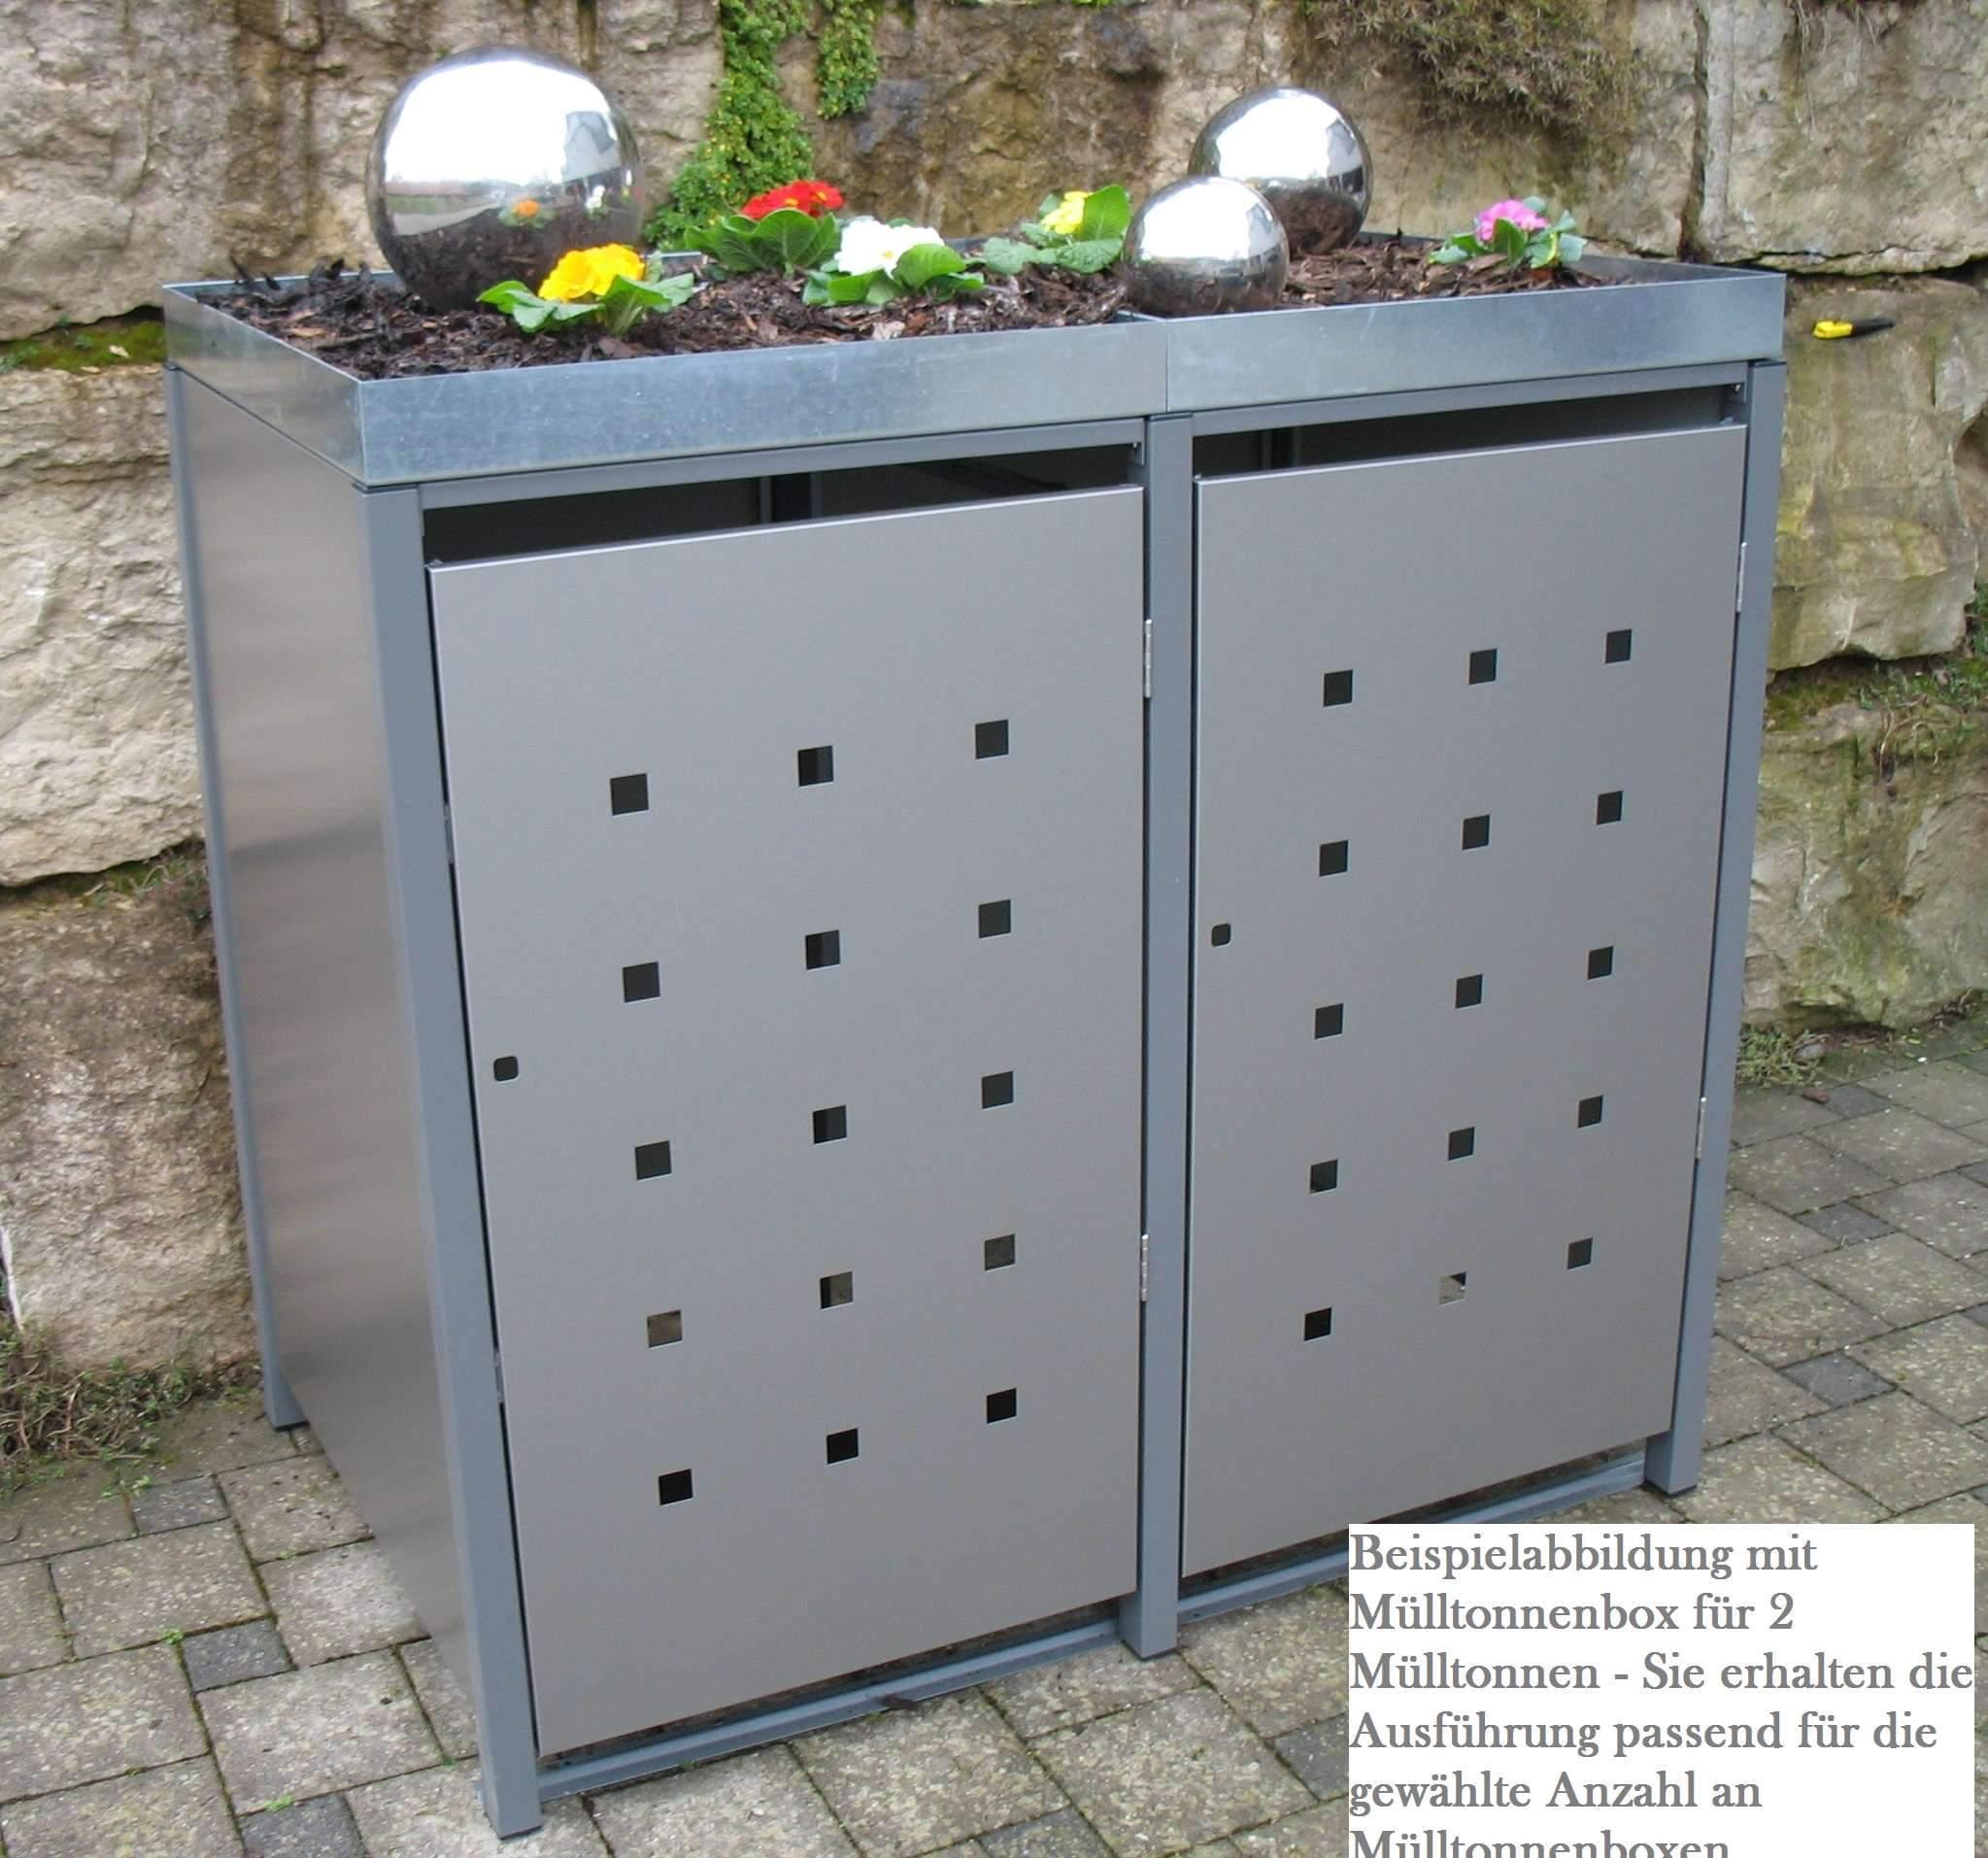 Muelltonnenbox dunkelgraumetallik5c6abe61dfe24 1280x1280 2x